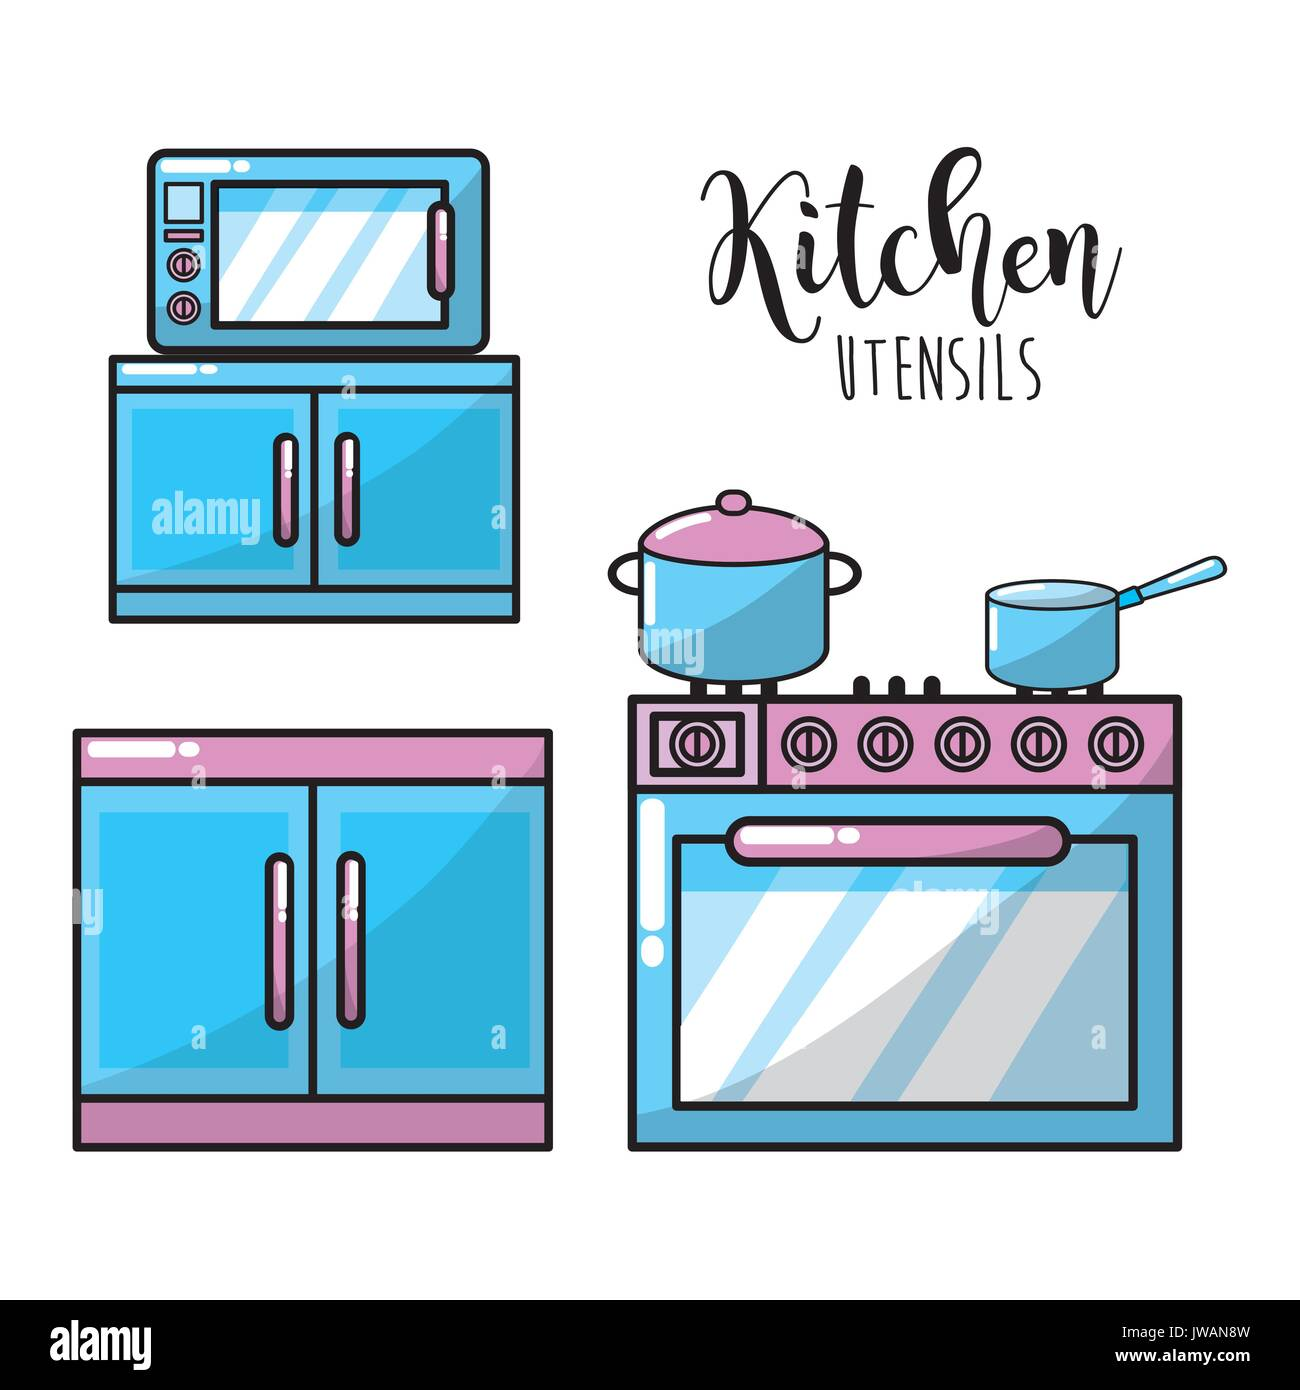 kitchen utensils traditional object element Stock Vector Art ...